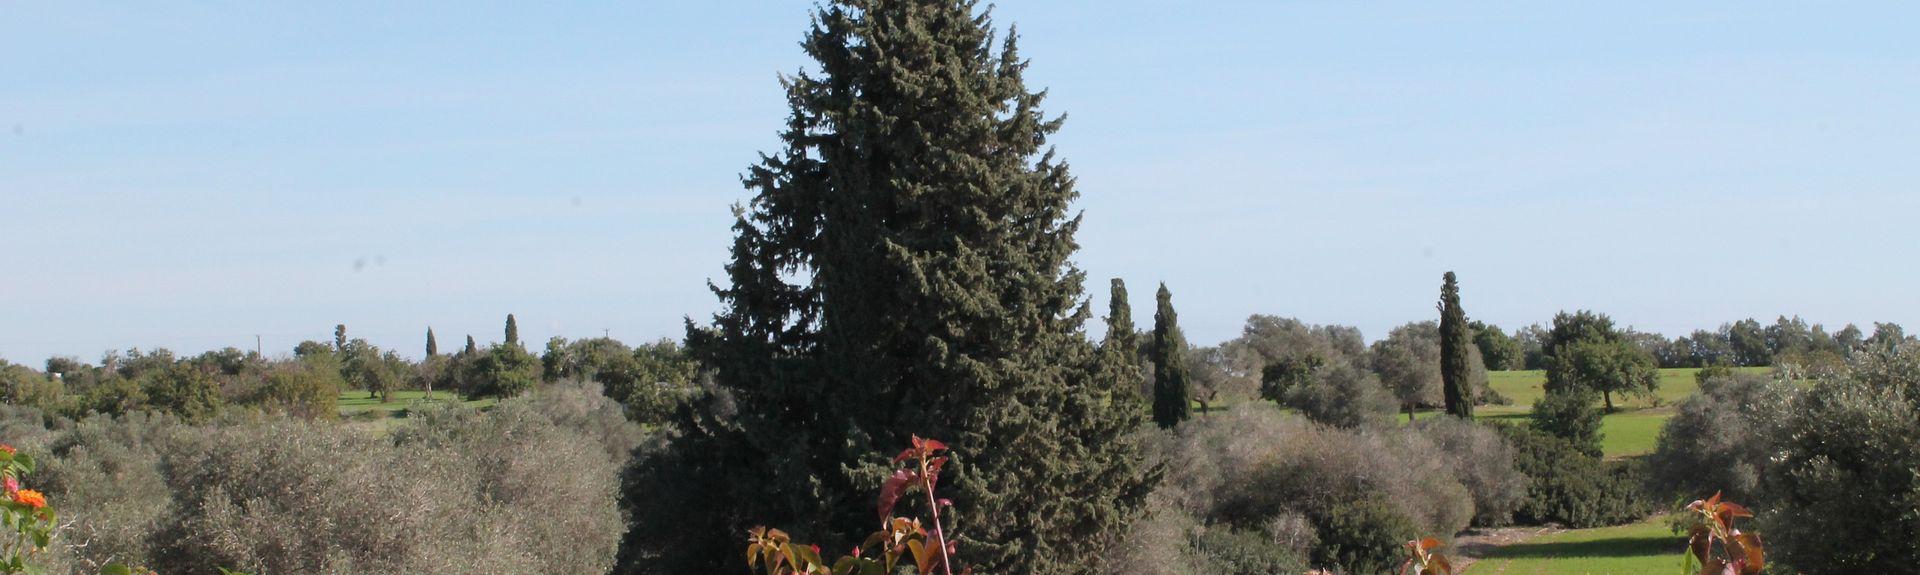 Perivolia, Larnaca, Cyprus